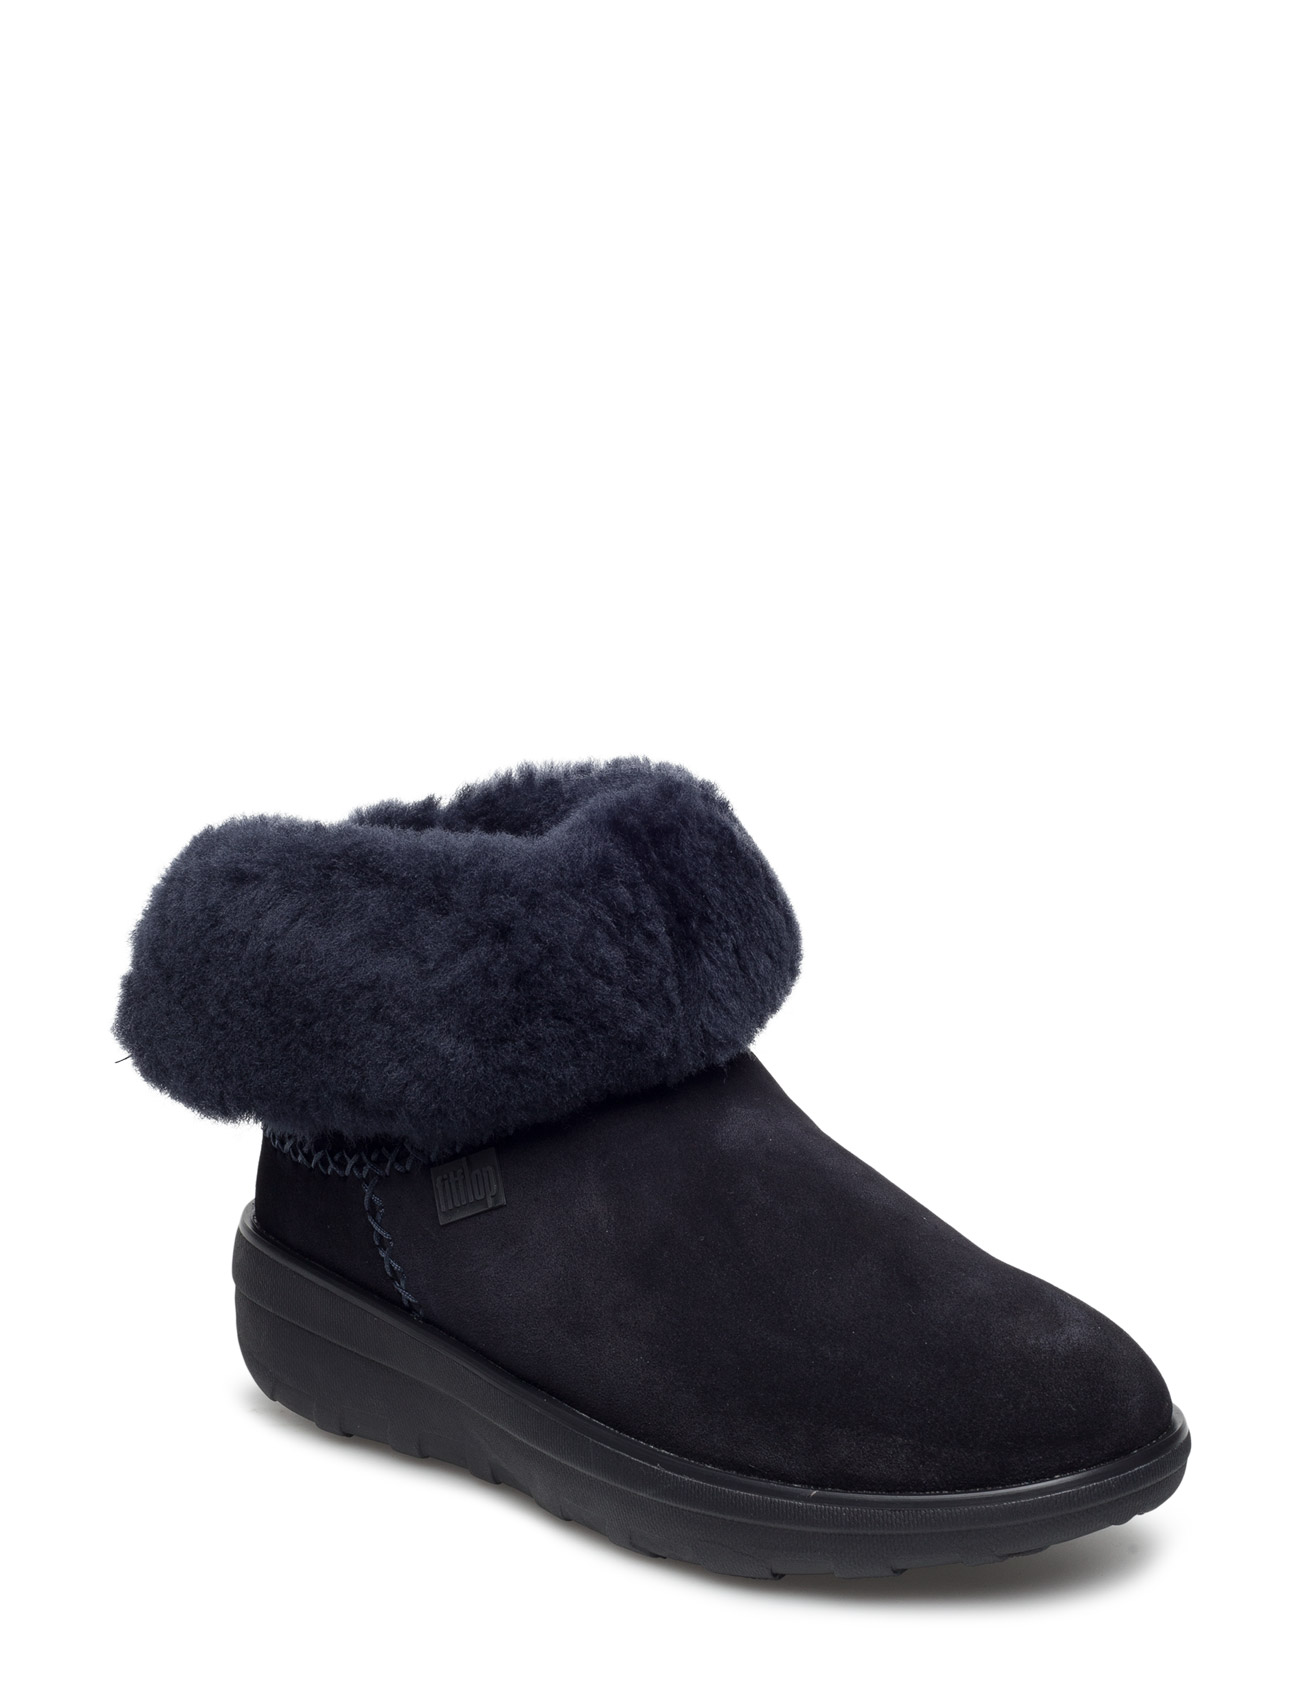 Supercush Mukloaff Shorty FitFlop Støvler til Damer i kastanje